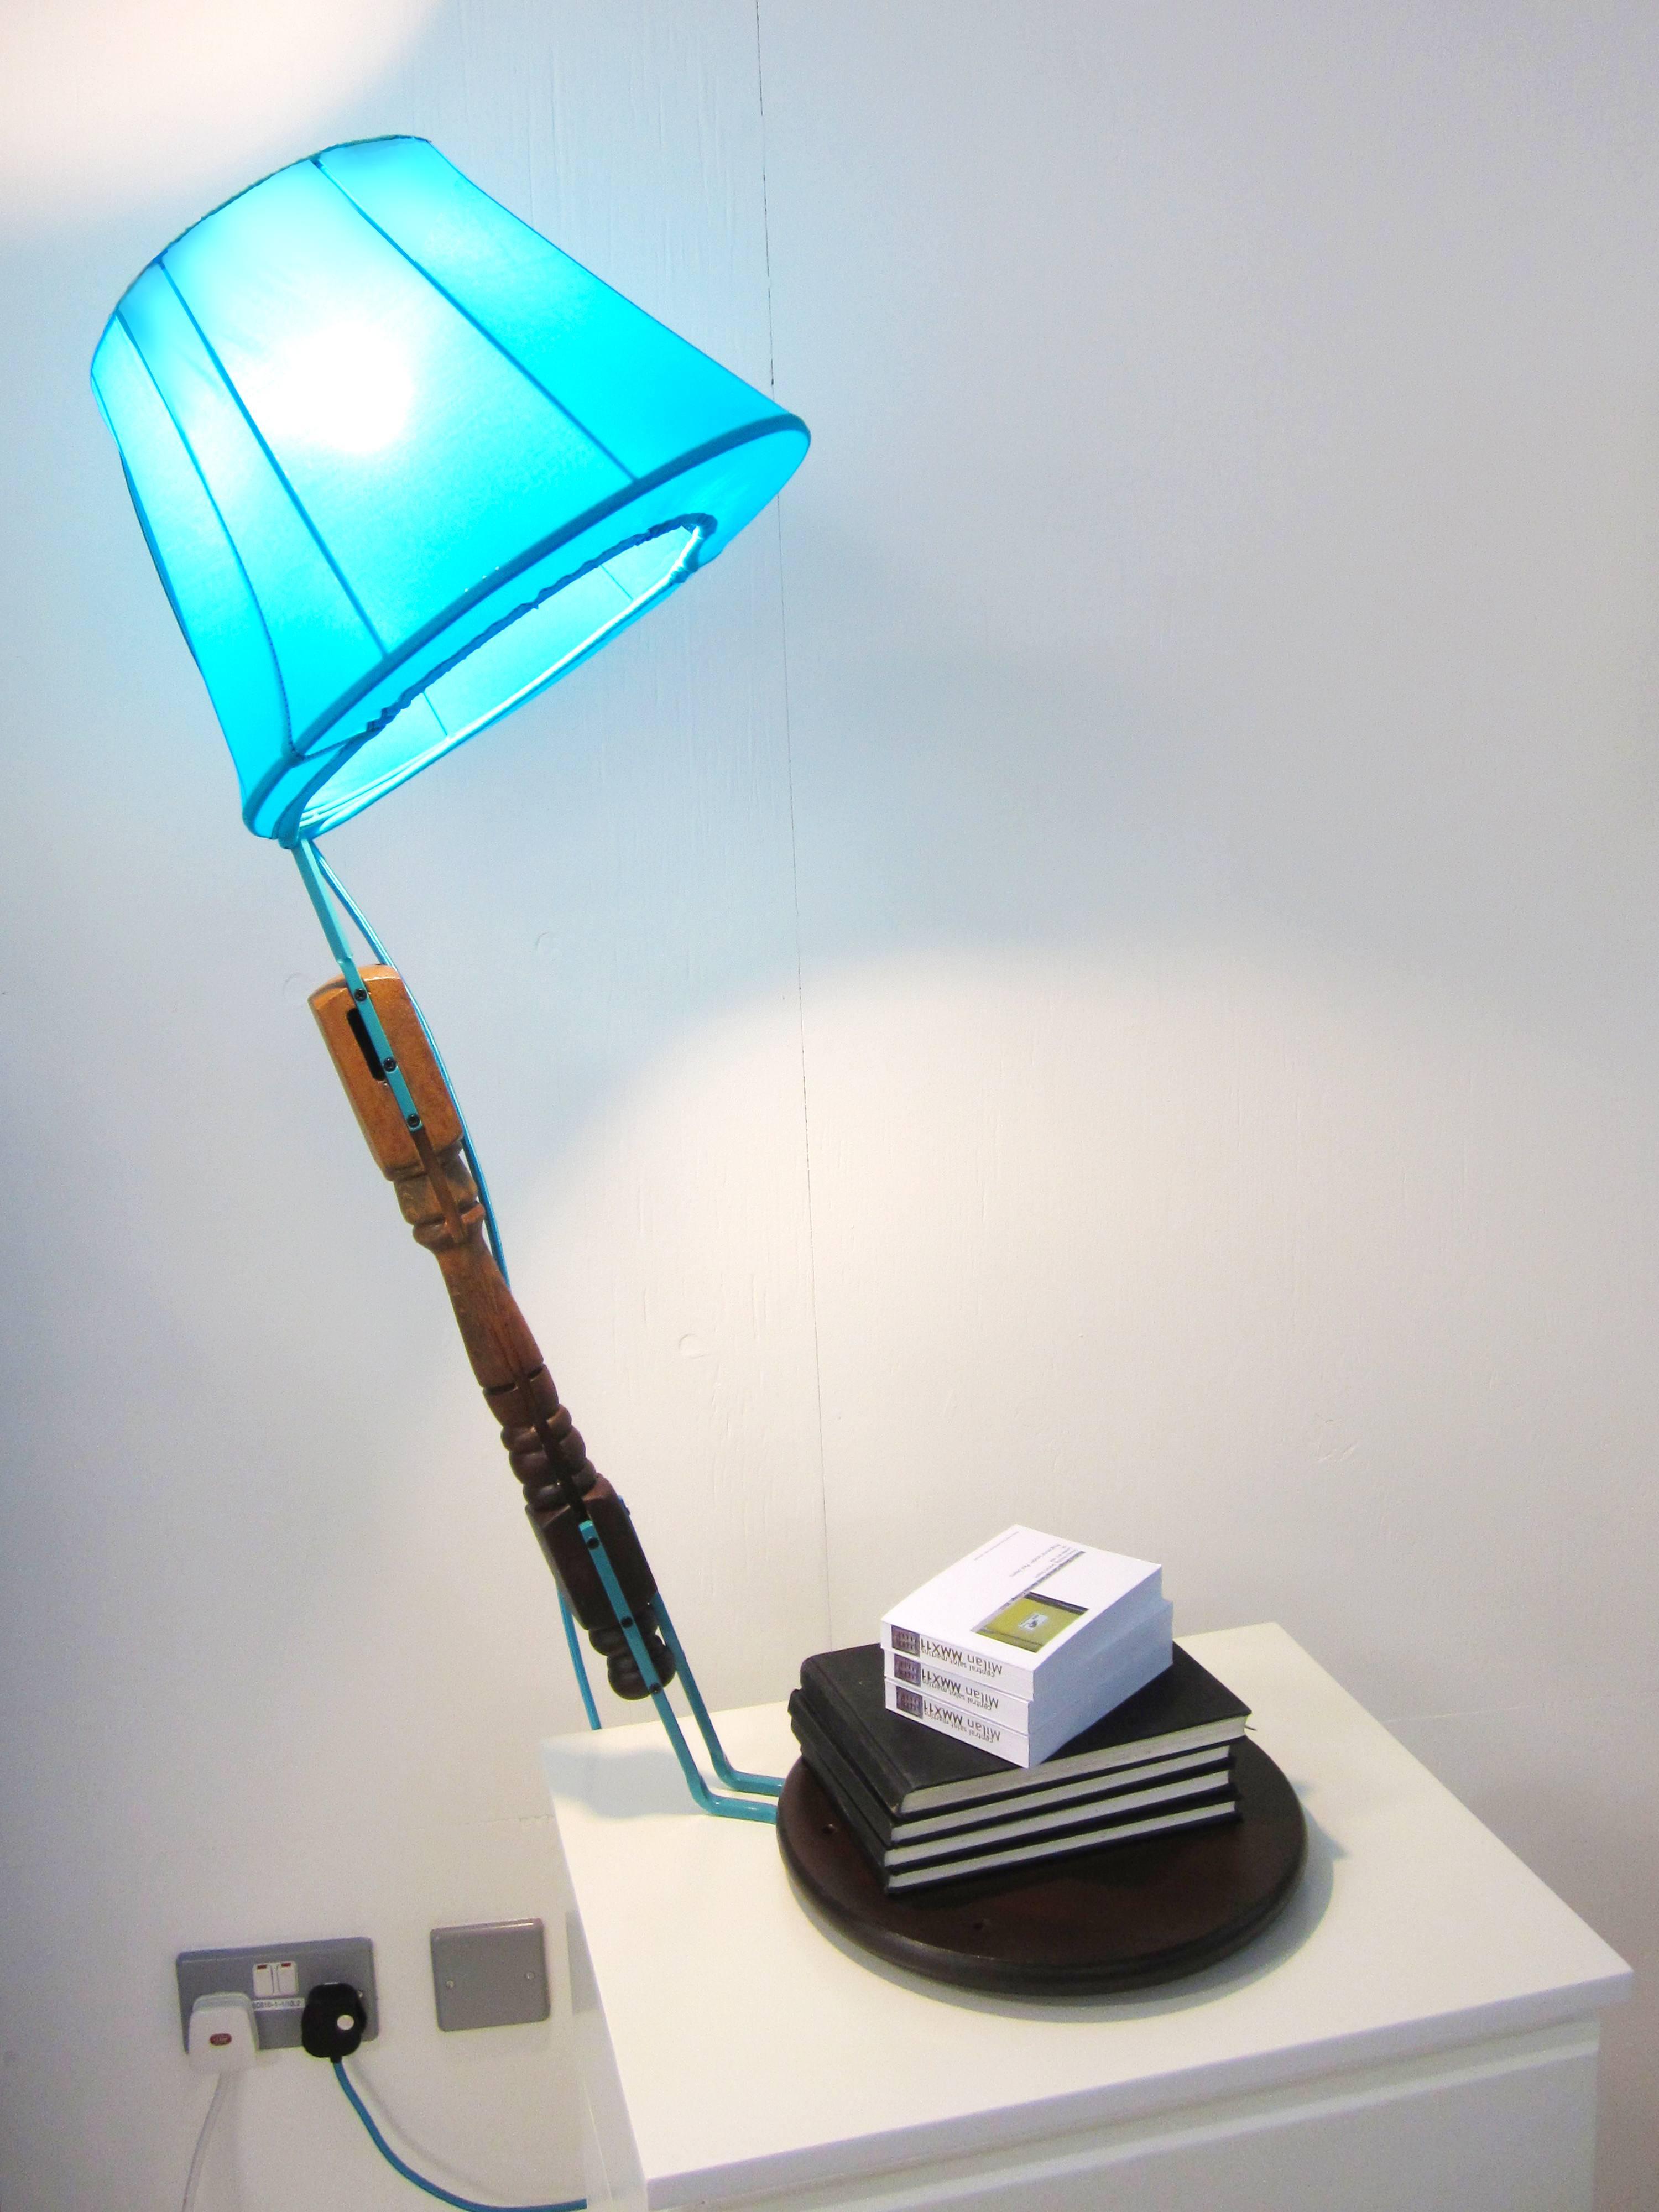 2012-10-04-jasonlloydfletcherThirdGenerationFurnitureleaningtablelamp.jpg